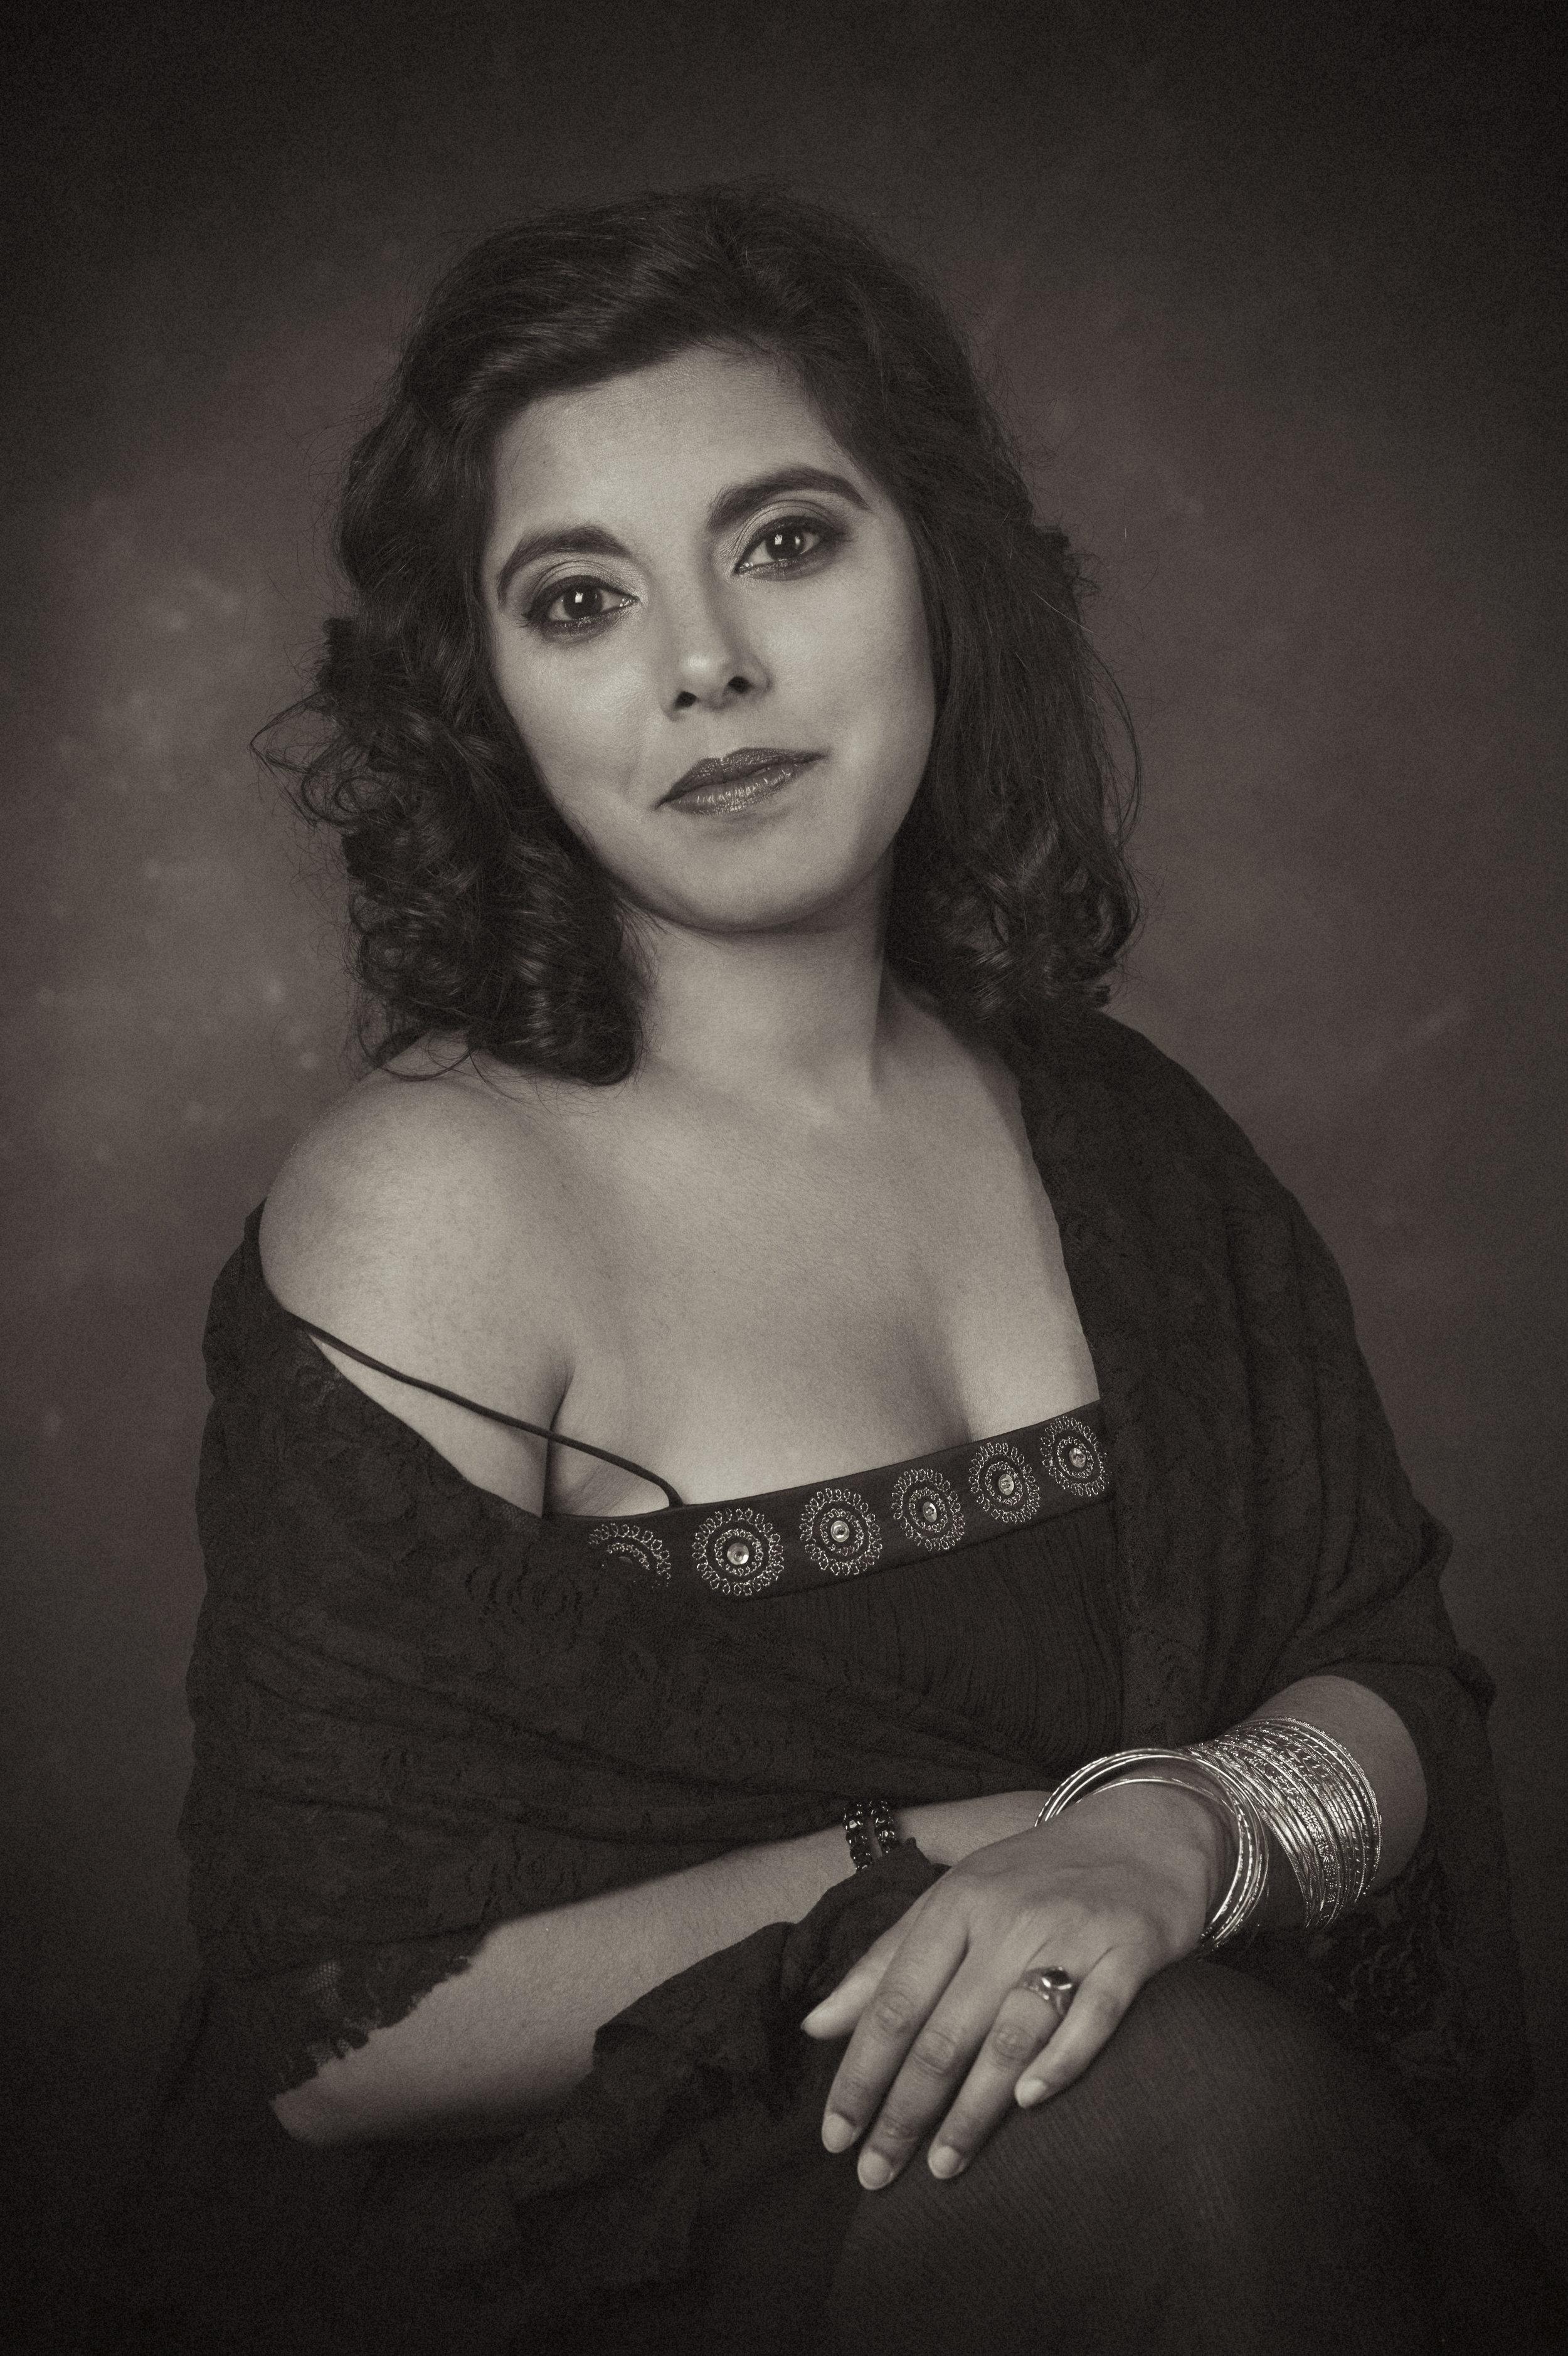 marta hewson - classical portraiture with multi culturaal woman.jpg